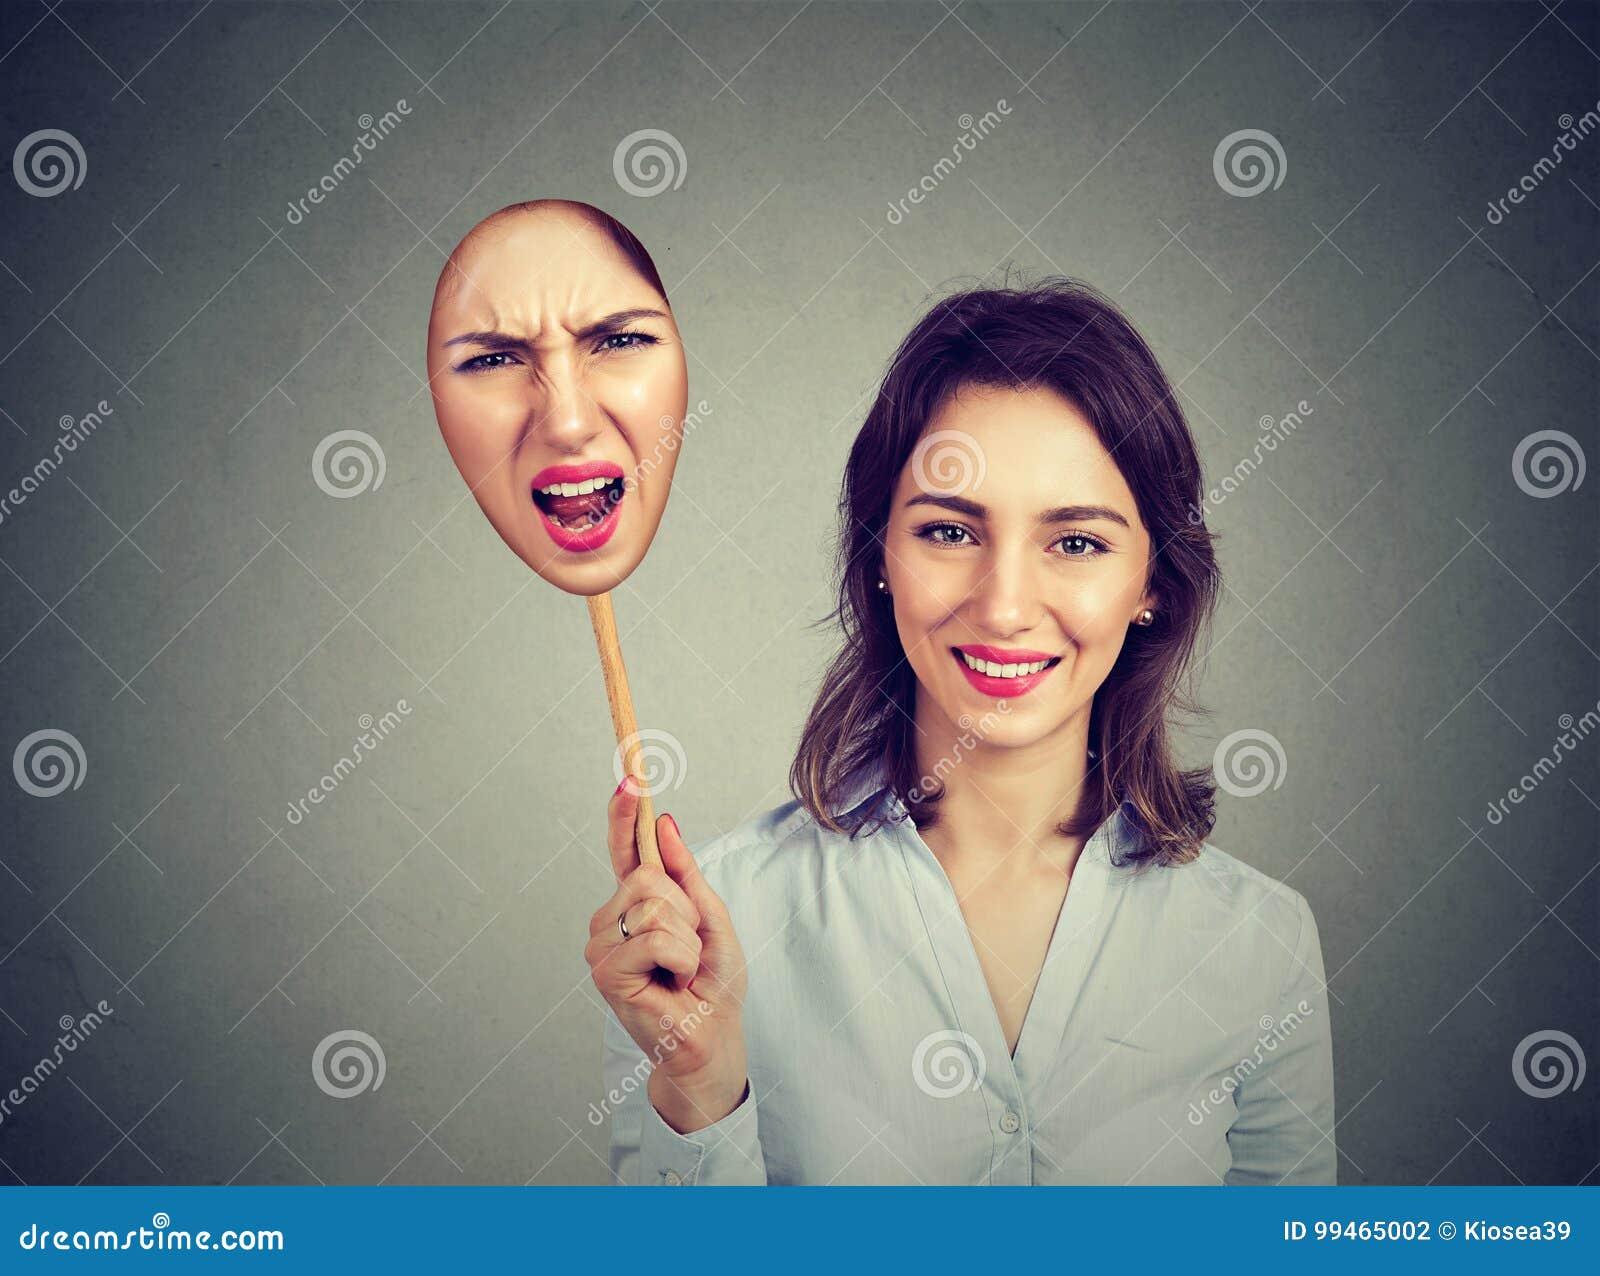 Mulher feliz que descola uma máscara irritada dsi mesma